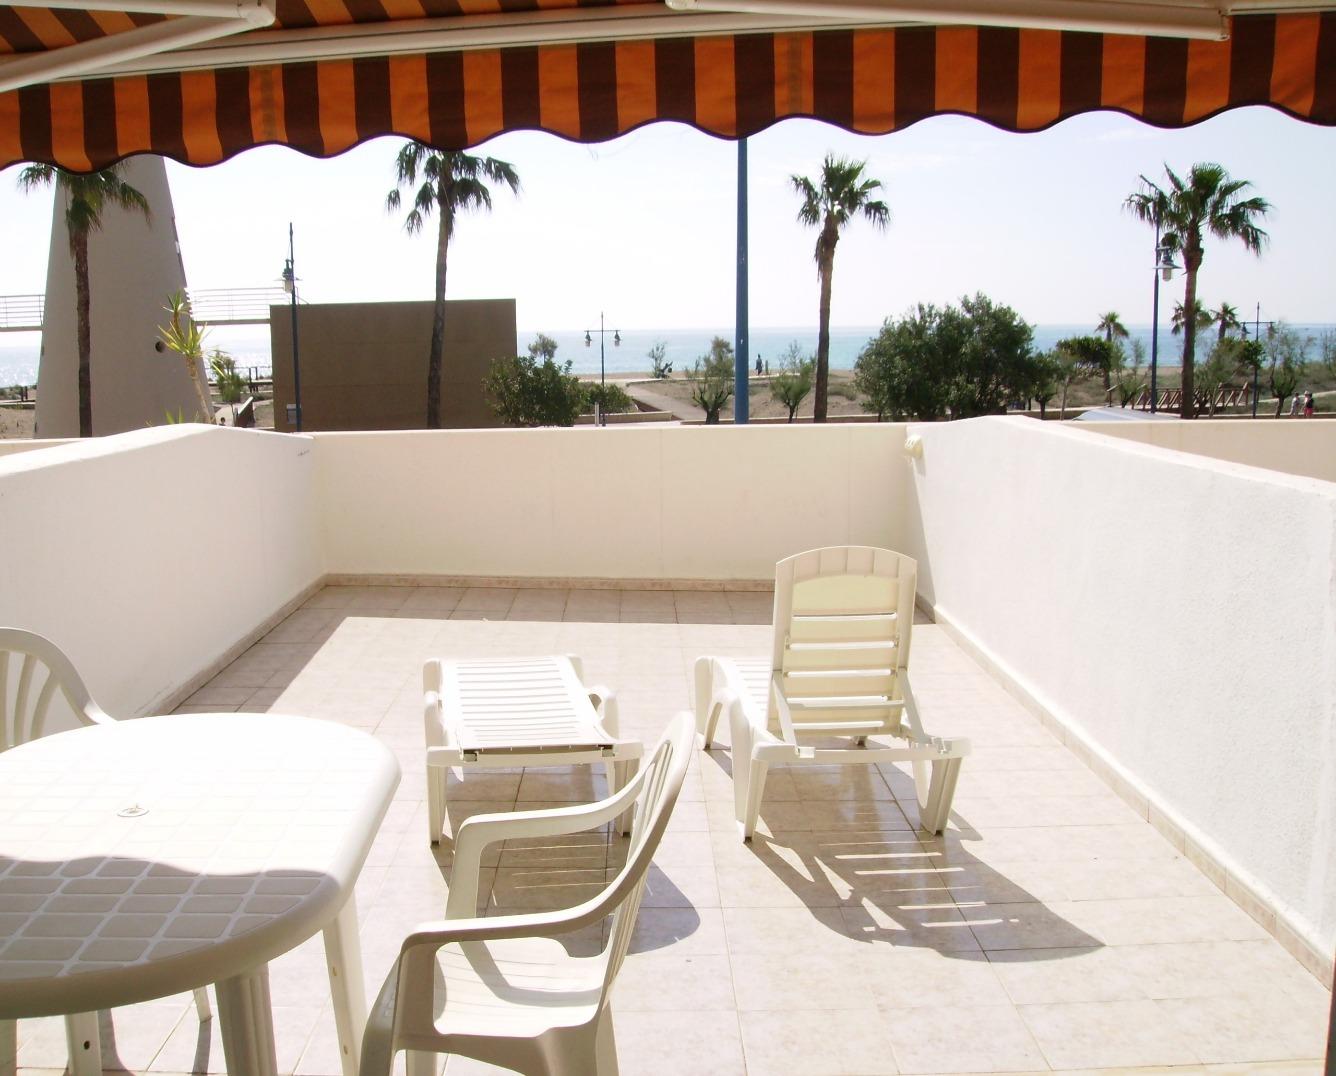 Lloguer de temporada Pis  Avenida valencia, 151-149. Apartamento de 50 m² con terraza, vistas frontales al mar, de 2